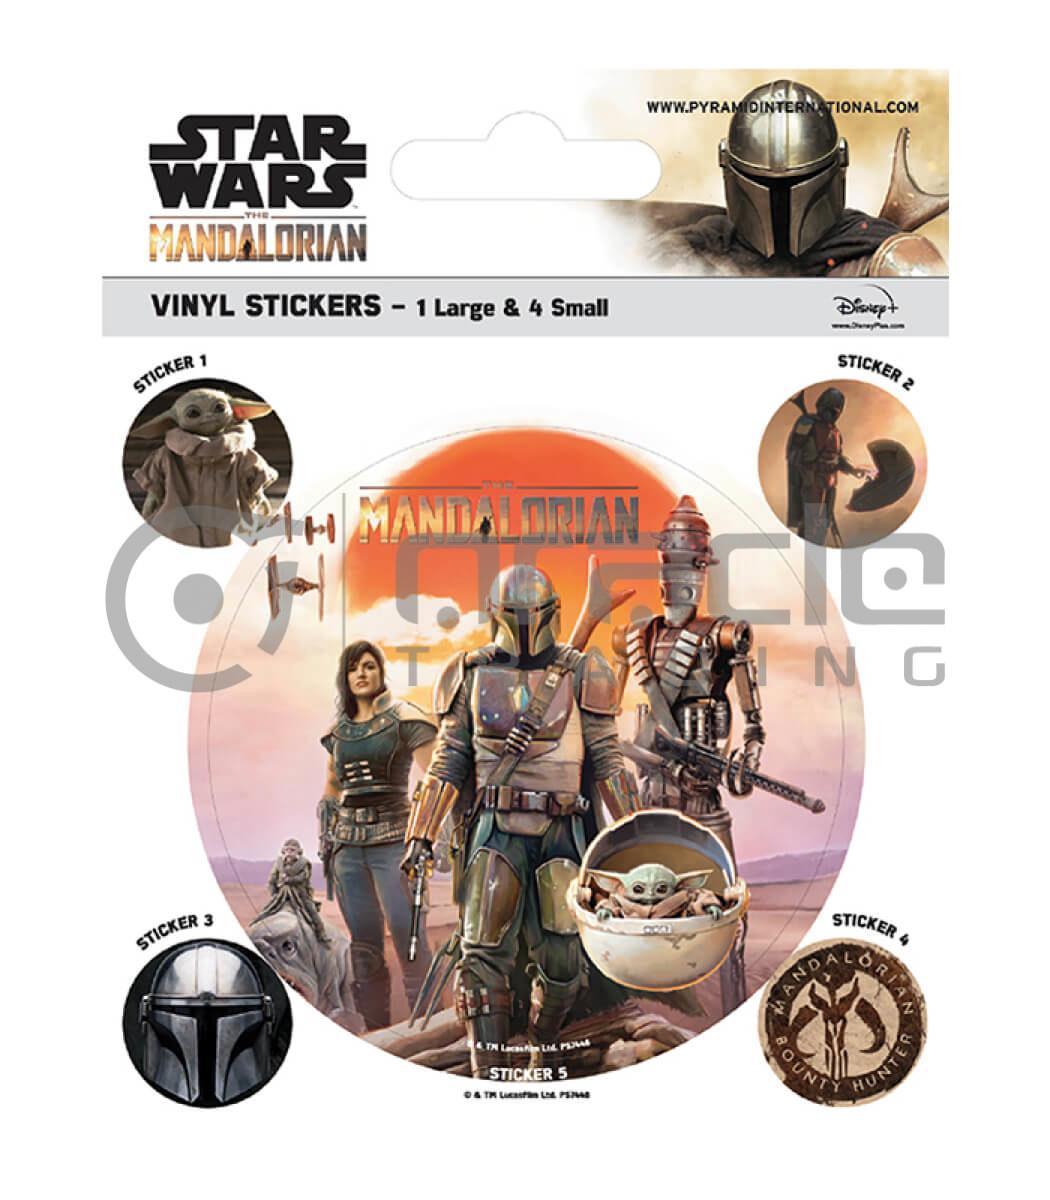 Star Wars: The Mandalorian Vinyl Sticker Pack - Cast